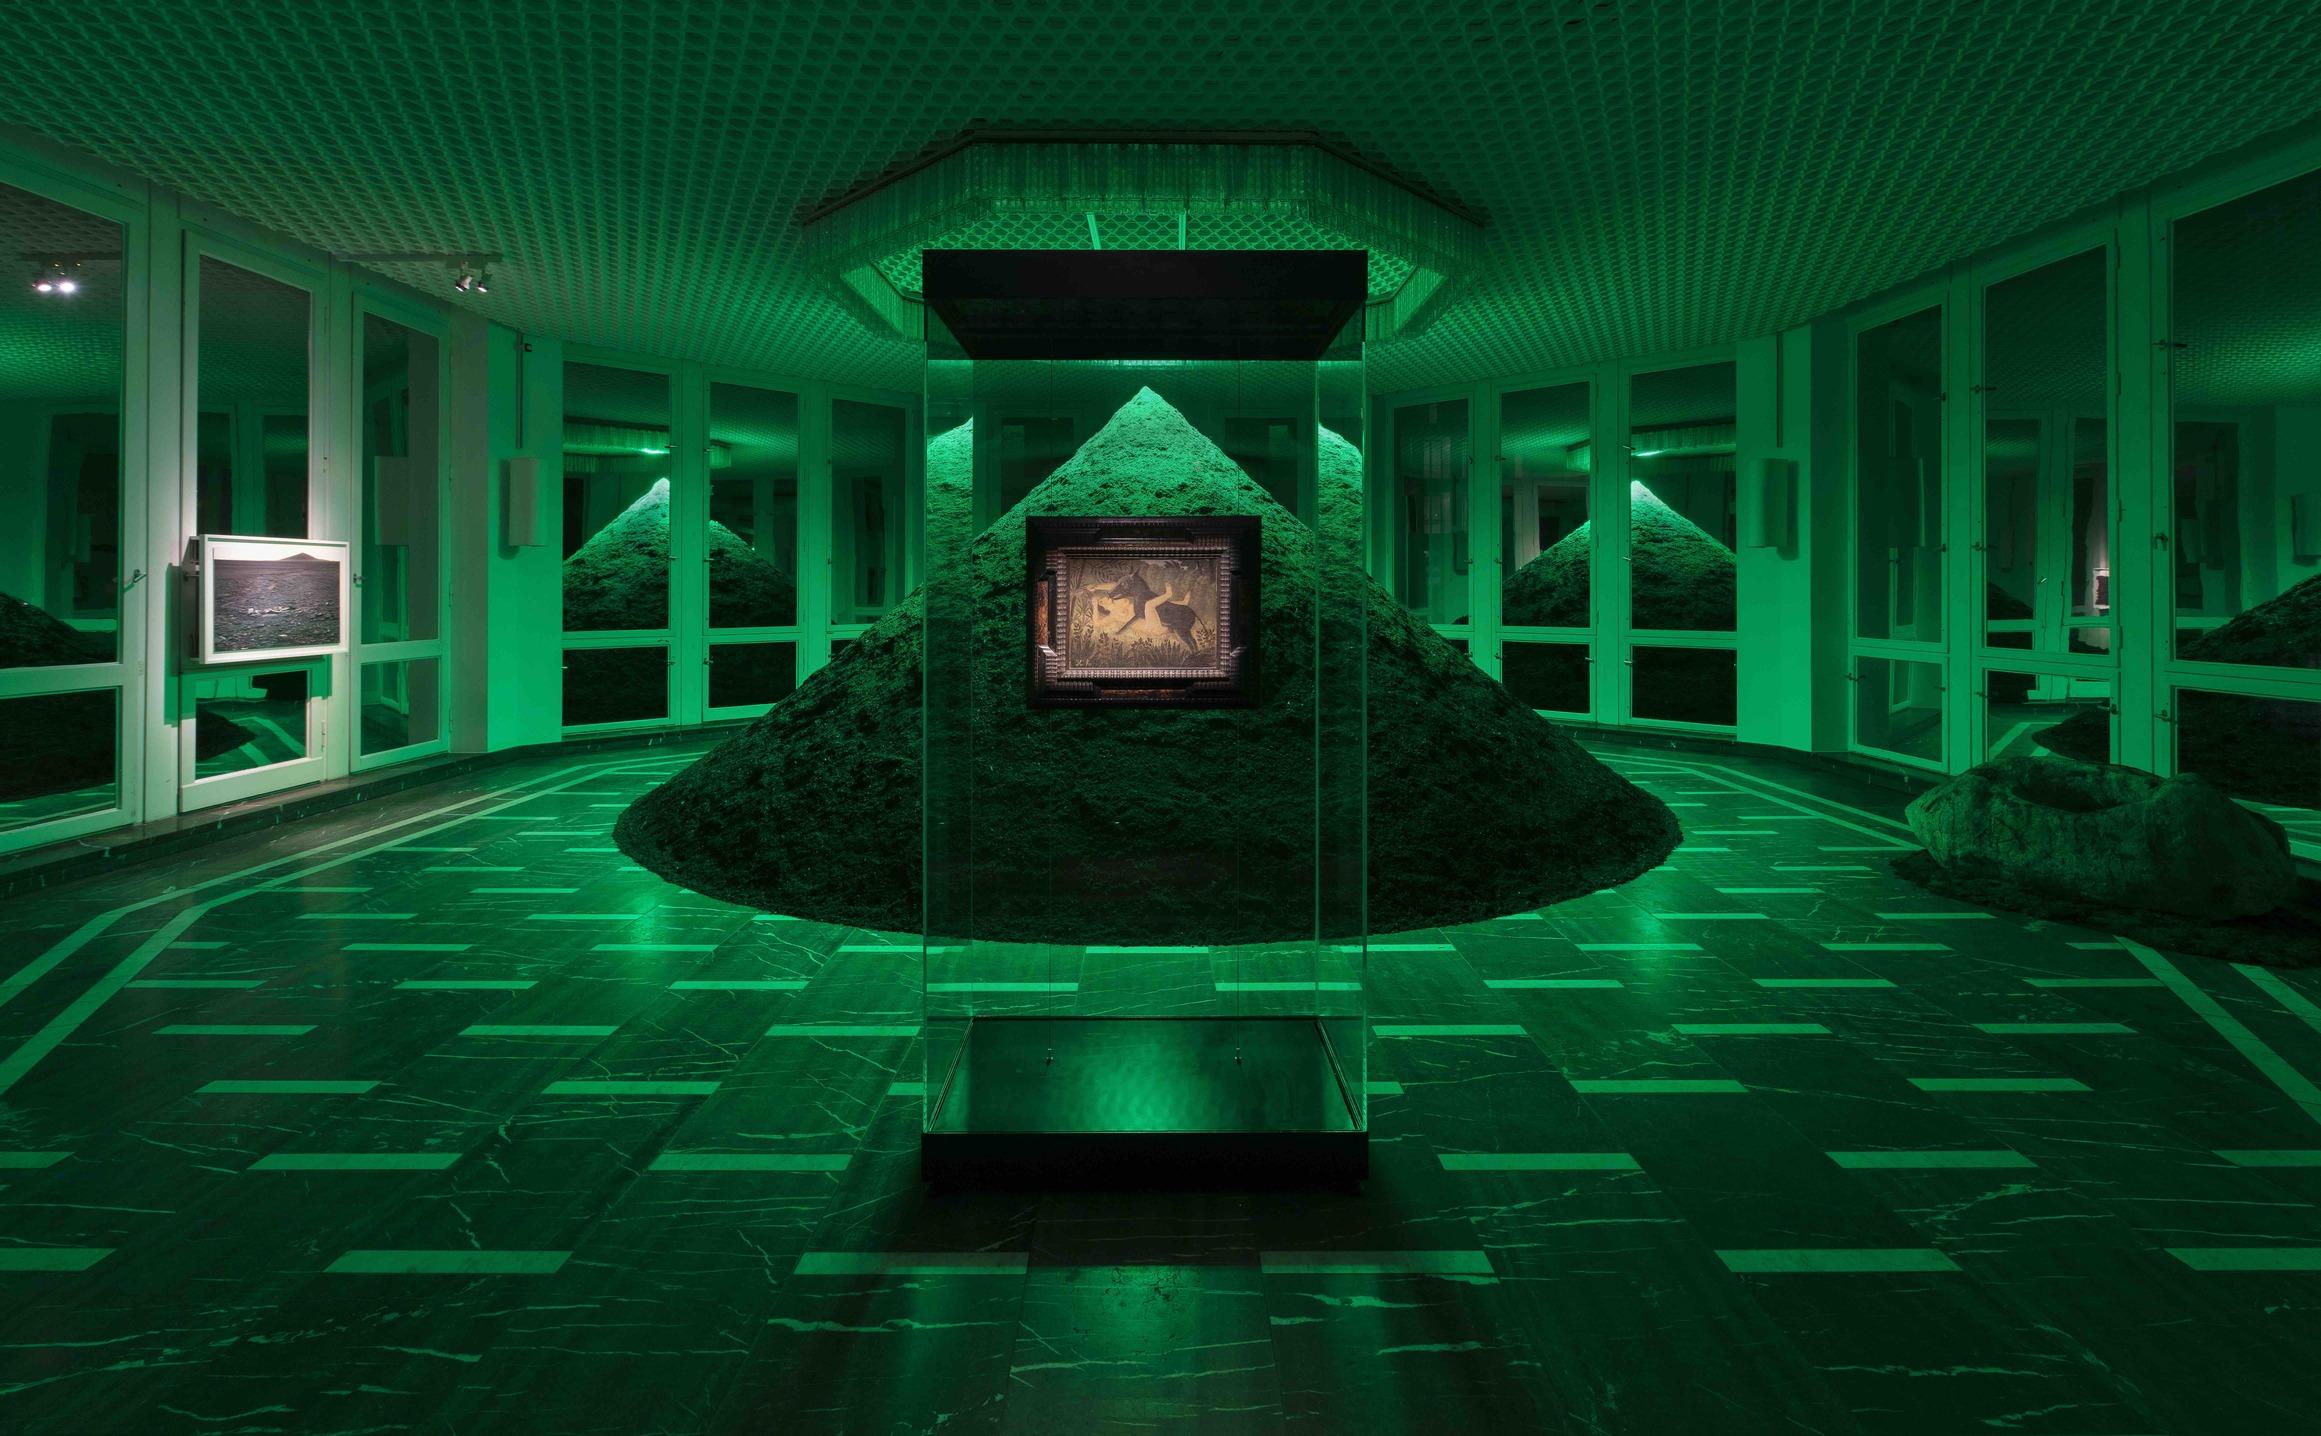 Installation View, Schinkel Pavillon, 2021